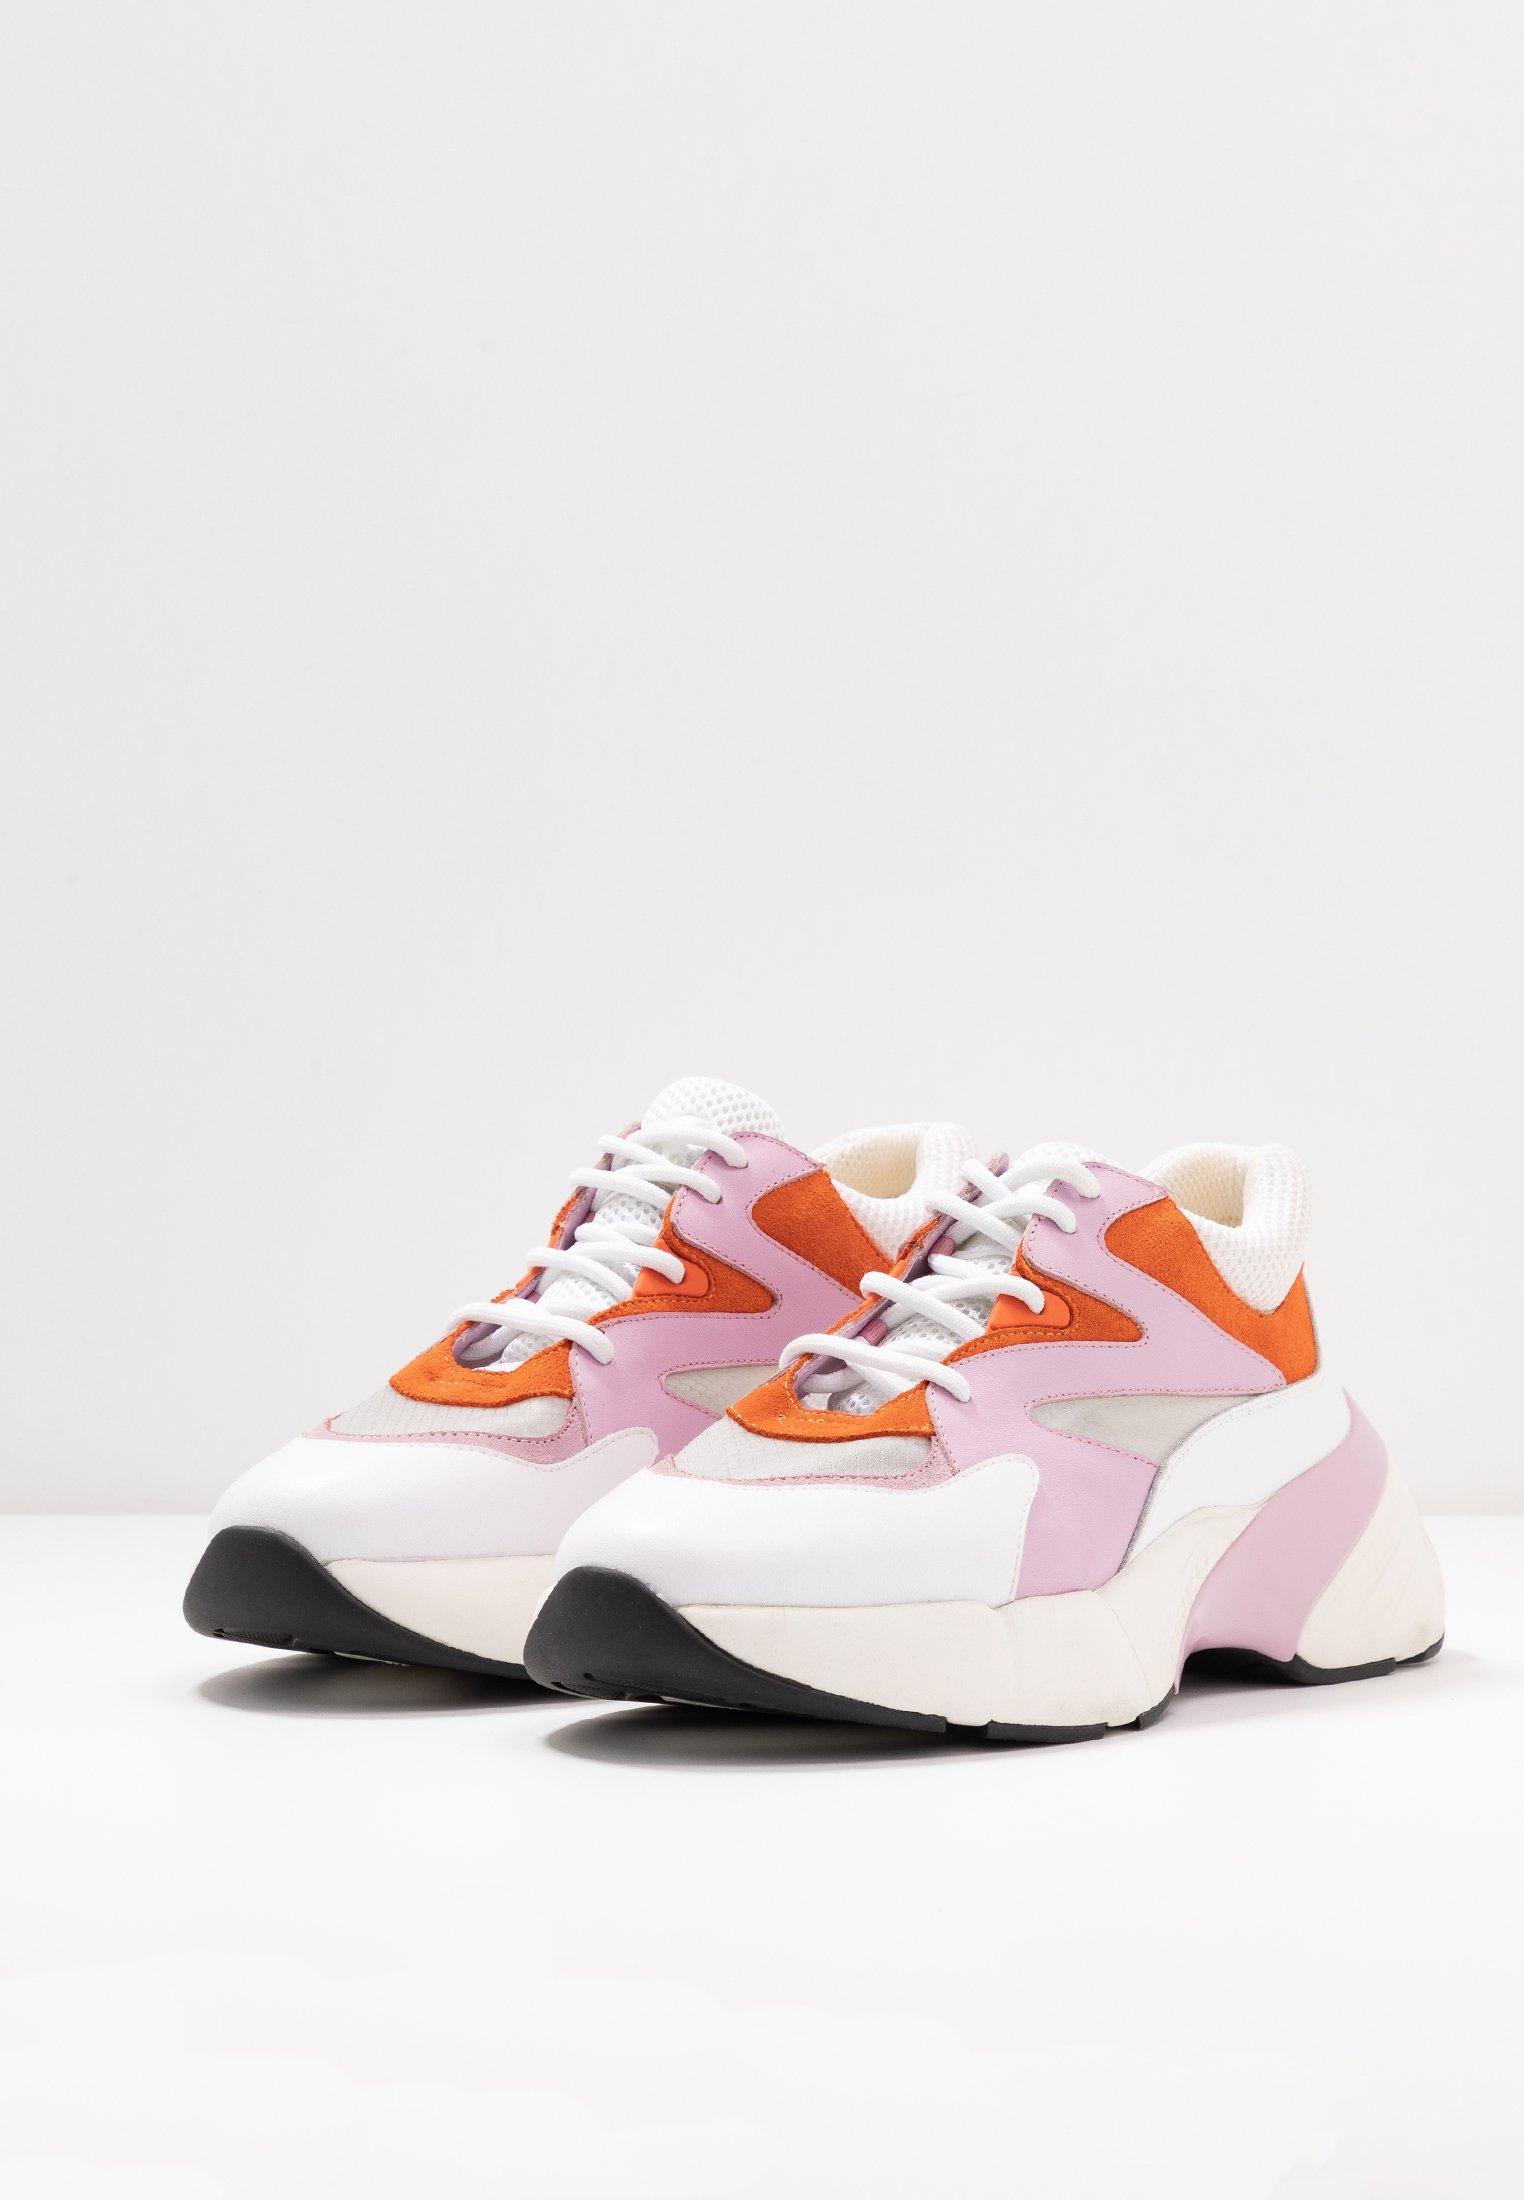 Pinko Maggiorana - Baskets Basses Bianco/rosa/arancio